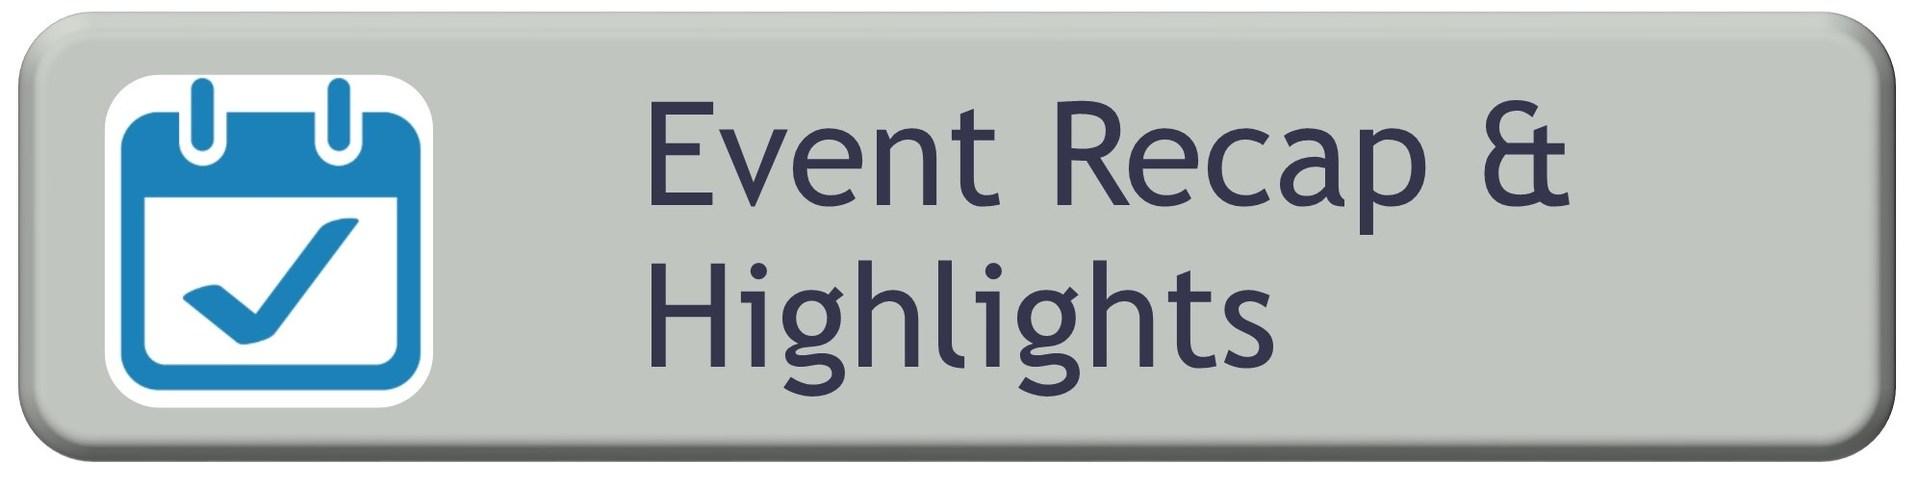 Event Recap/Highlight